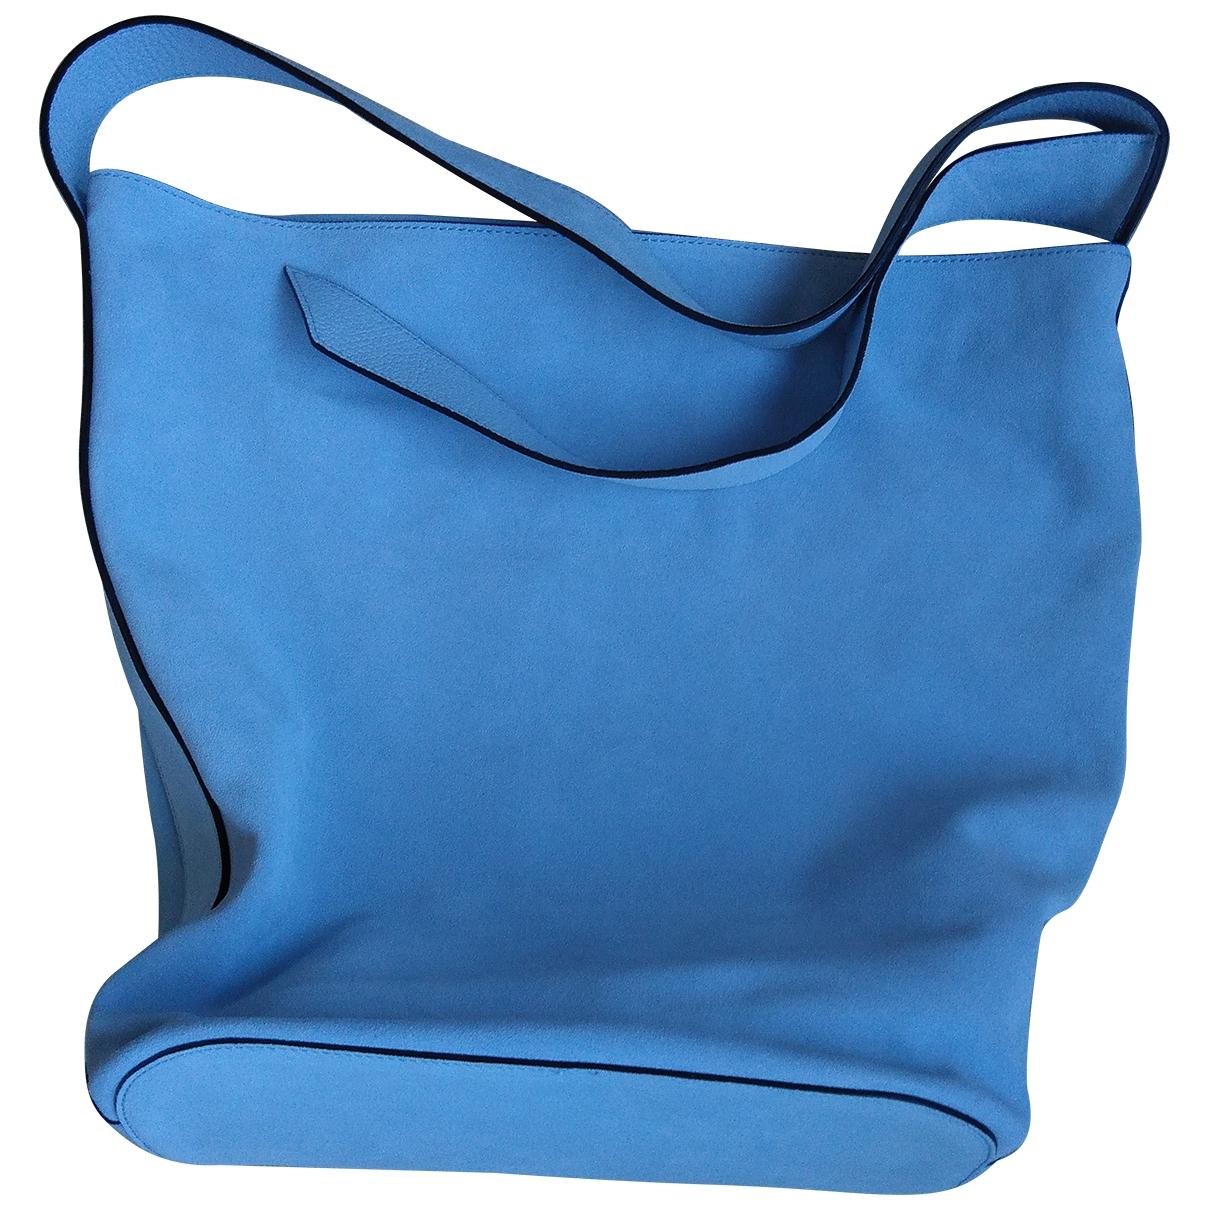 Coccinelle \N Blue Suede handbag for Women \N